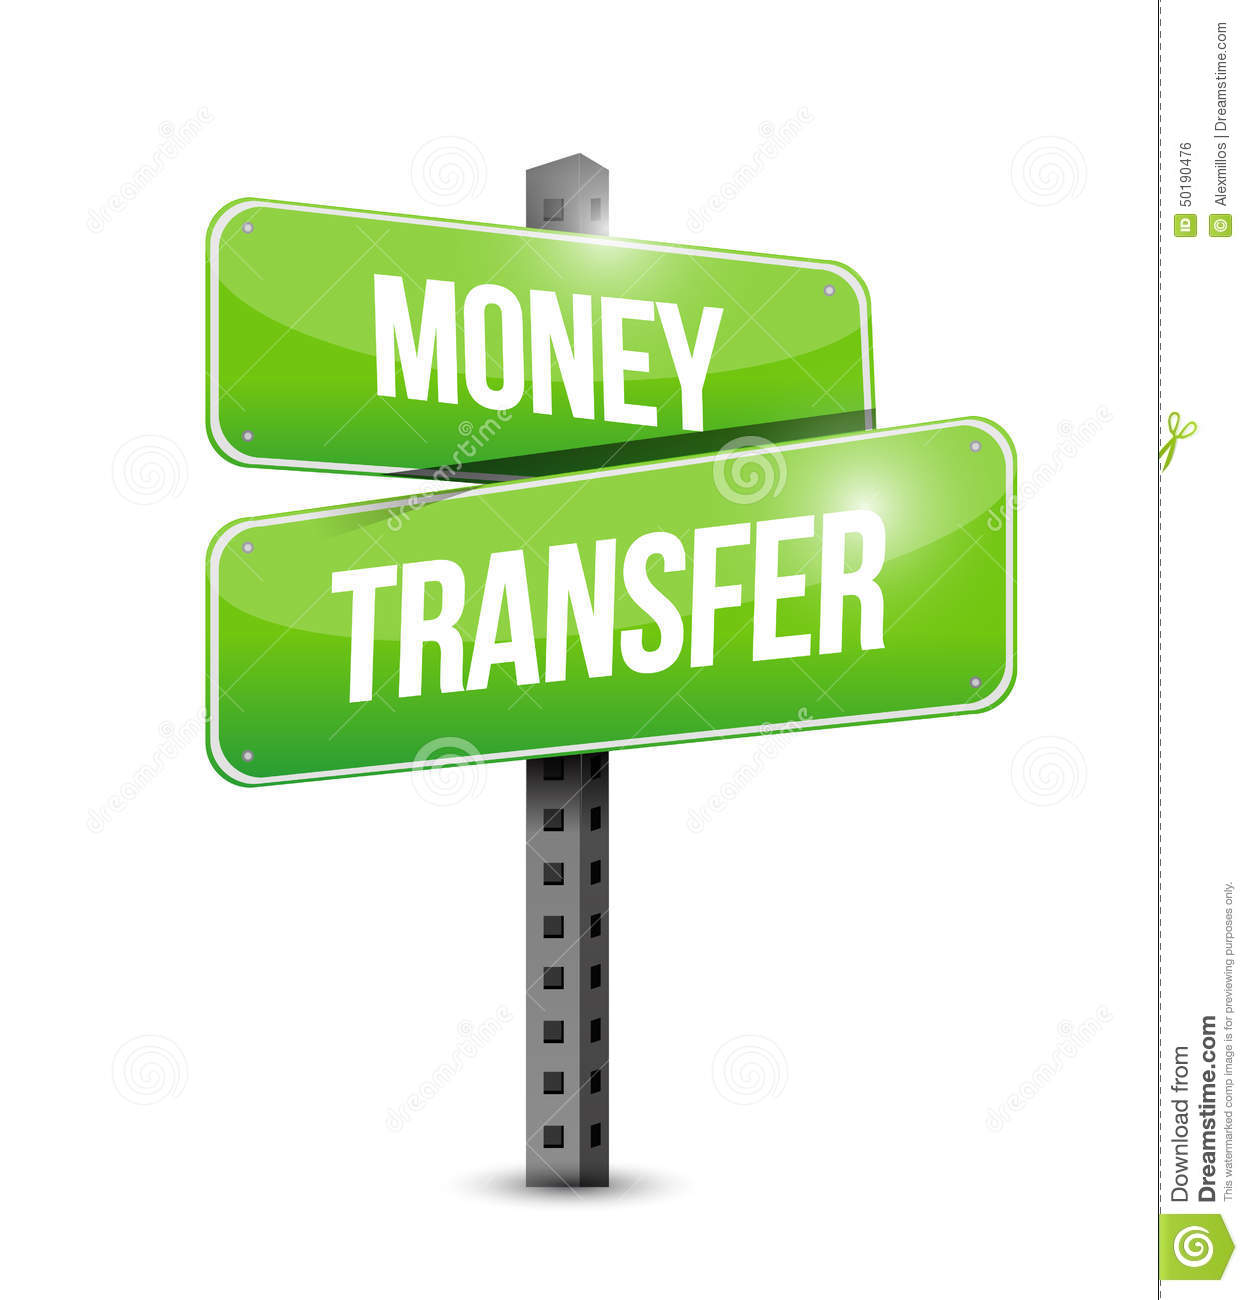 Money transfer clipart clip art transparent stock Money Transfer Road Sign Illustration Design Stock Illustration ... clip art transparent stock